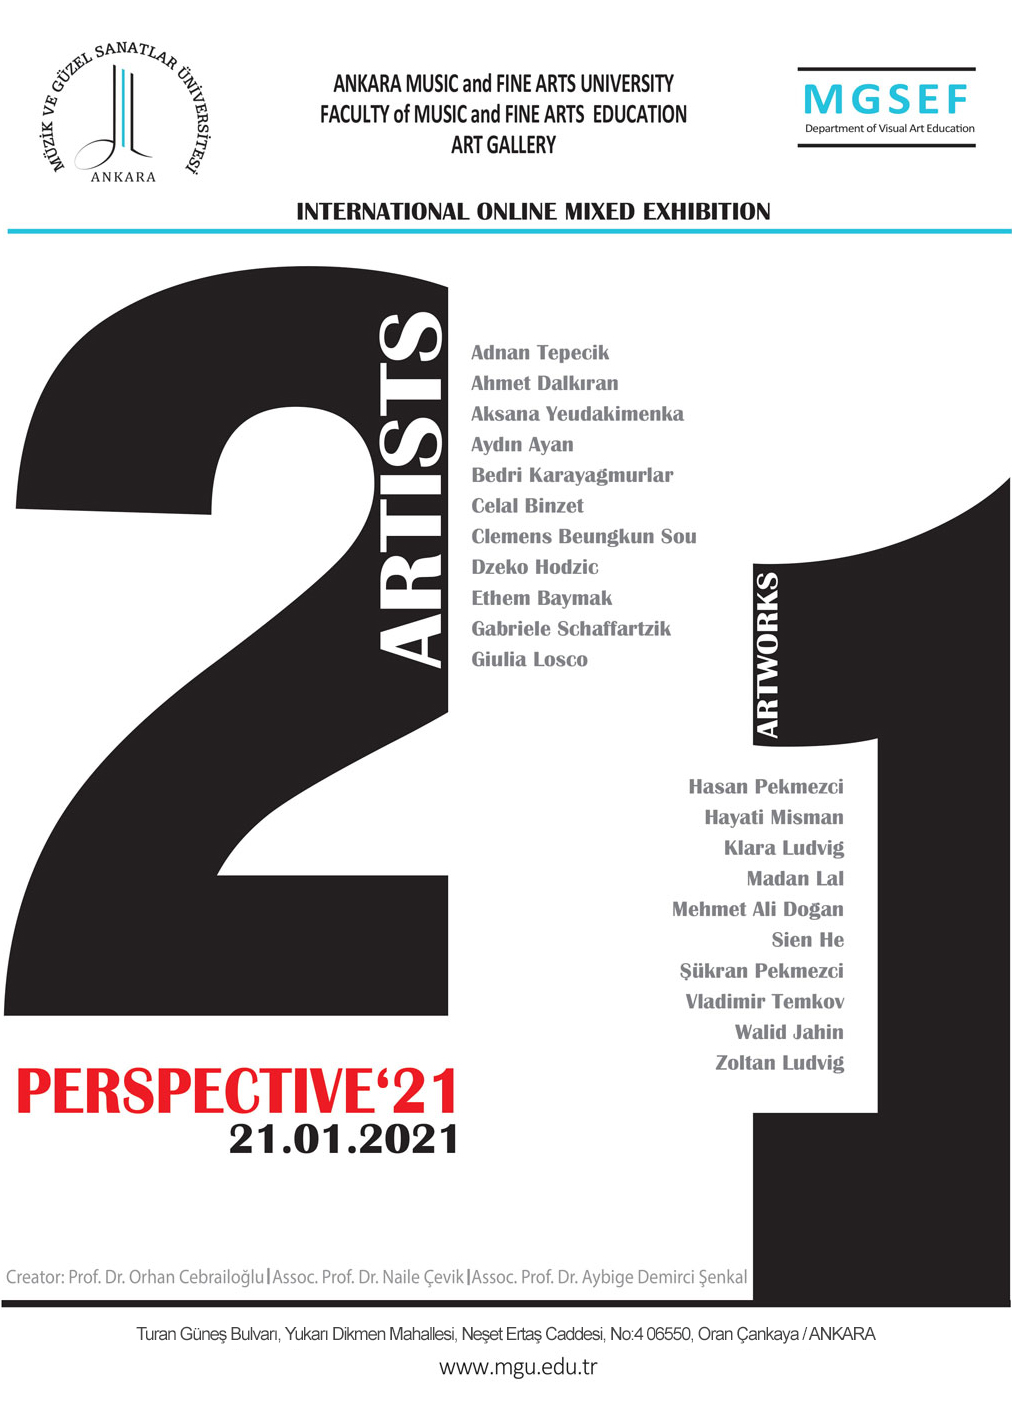 PERSPECTIVE'21 INTERNATIONAL ONLINE MIXED EXHIBITION